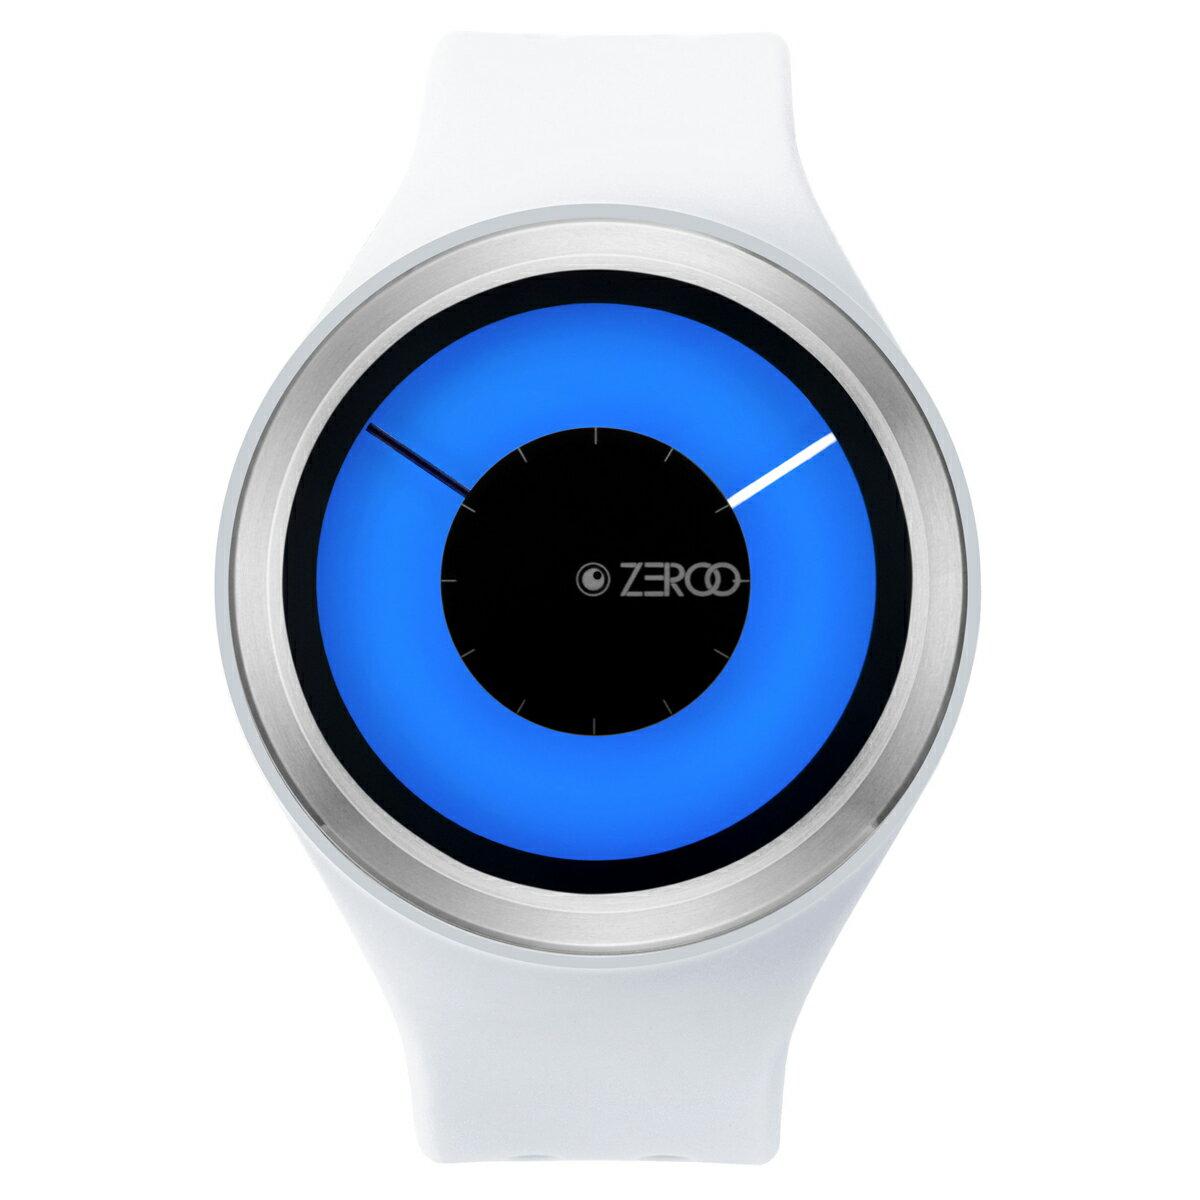 ZEROO MAGIA AURORA ゼロ 電池式クォーツ 腕時計 [W00802B01SR01] ホワイト デザインウォッチ ペア用 メンズ レディース ユニセックス おしゃれ時計 デザイナーズ